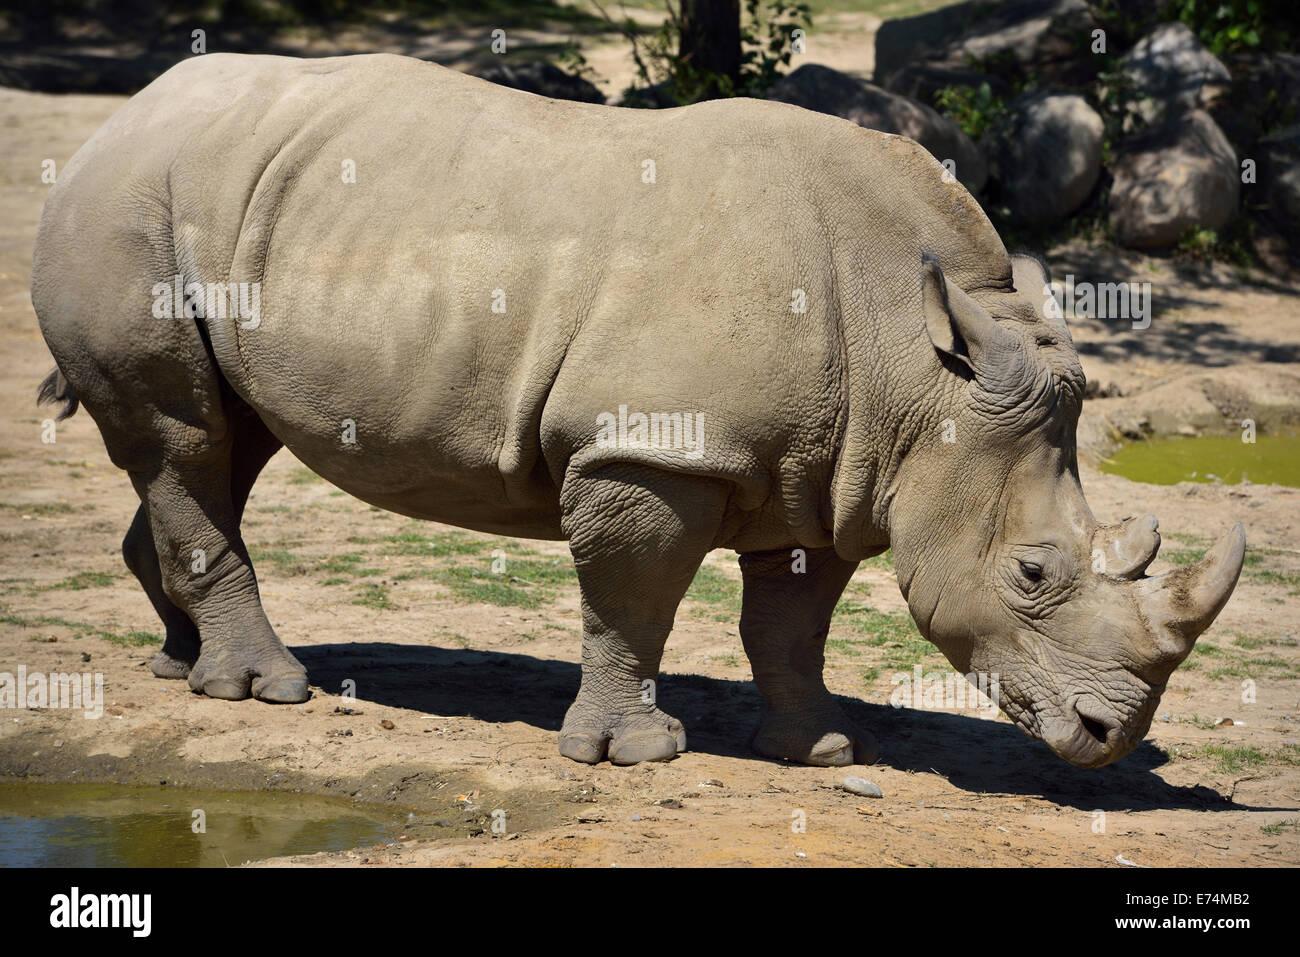 Female Southern White Rhinoceros Ceratotherium simum standing at watering hole Toronto Zoo - Stock Image